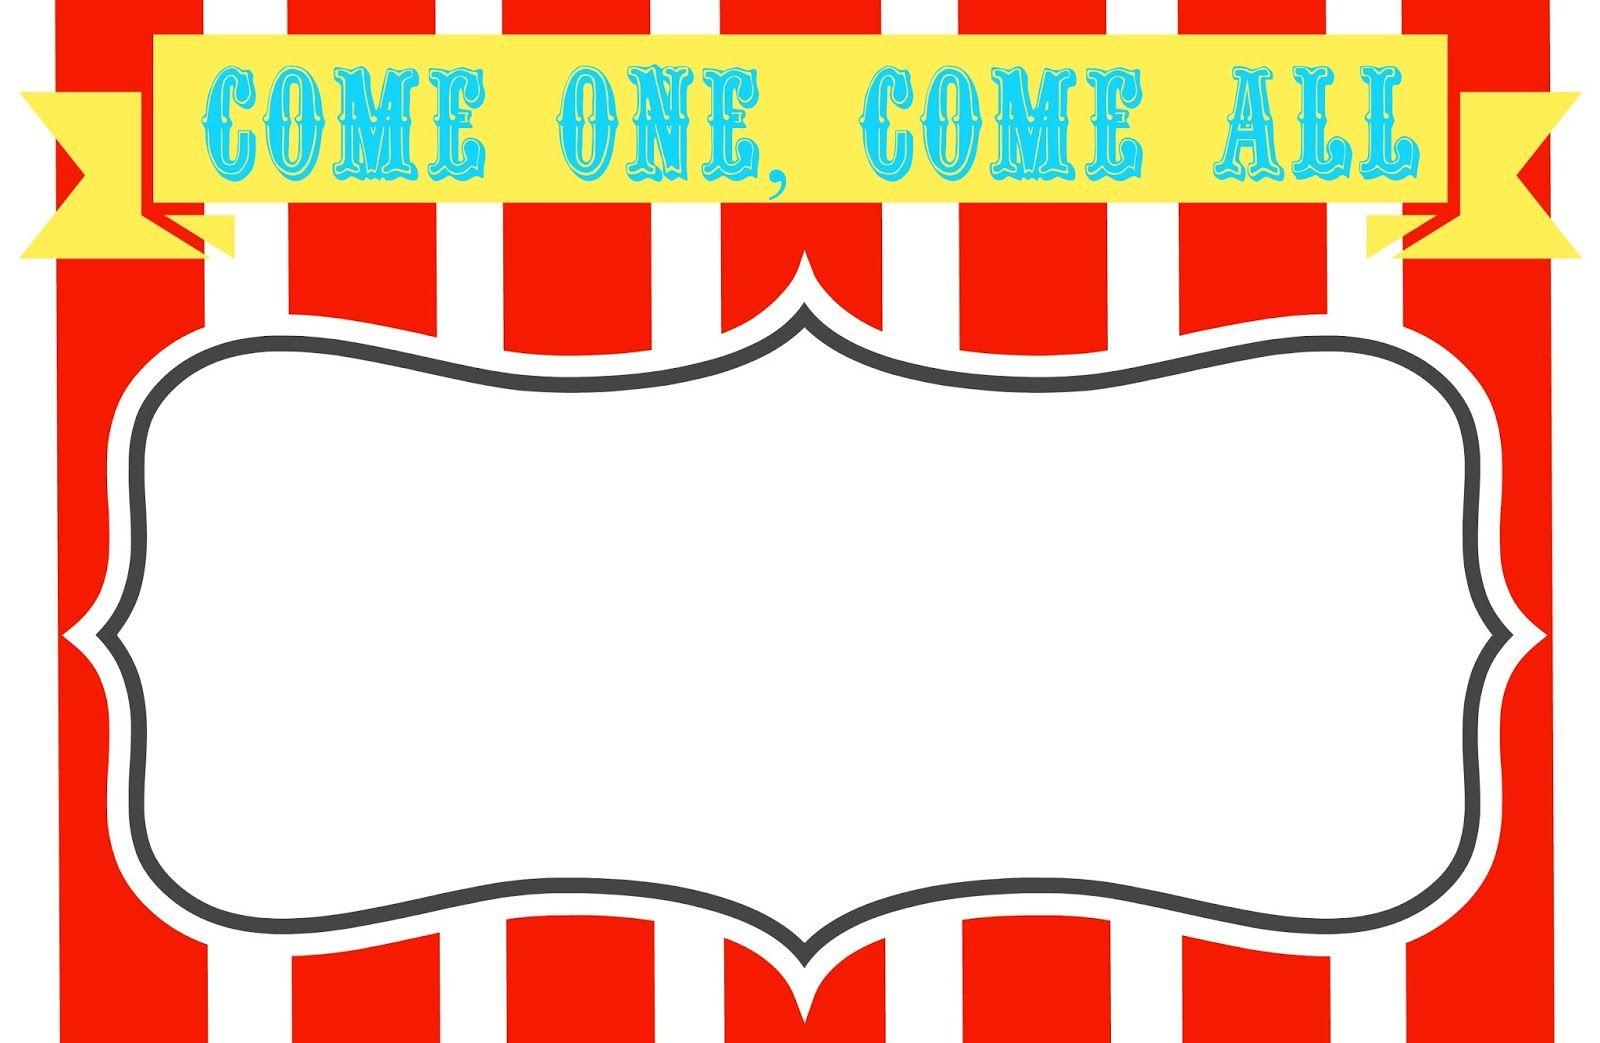 Printable circus templates 14 blank circus invitations templates printable circus templates 14 blank circus invitations templates free free cliparts that you stopboris Choice Image